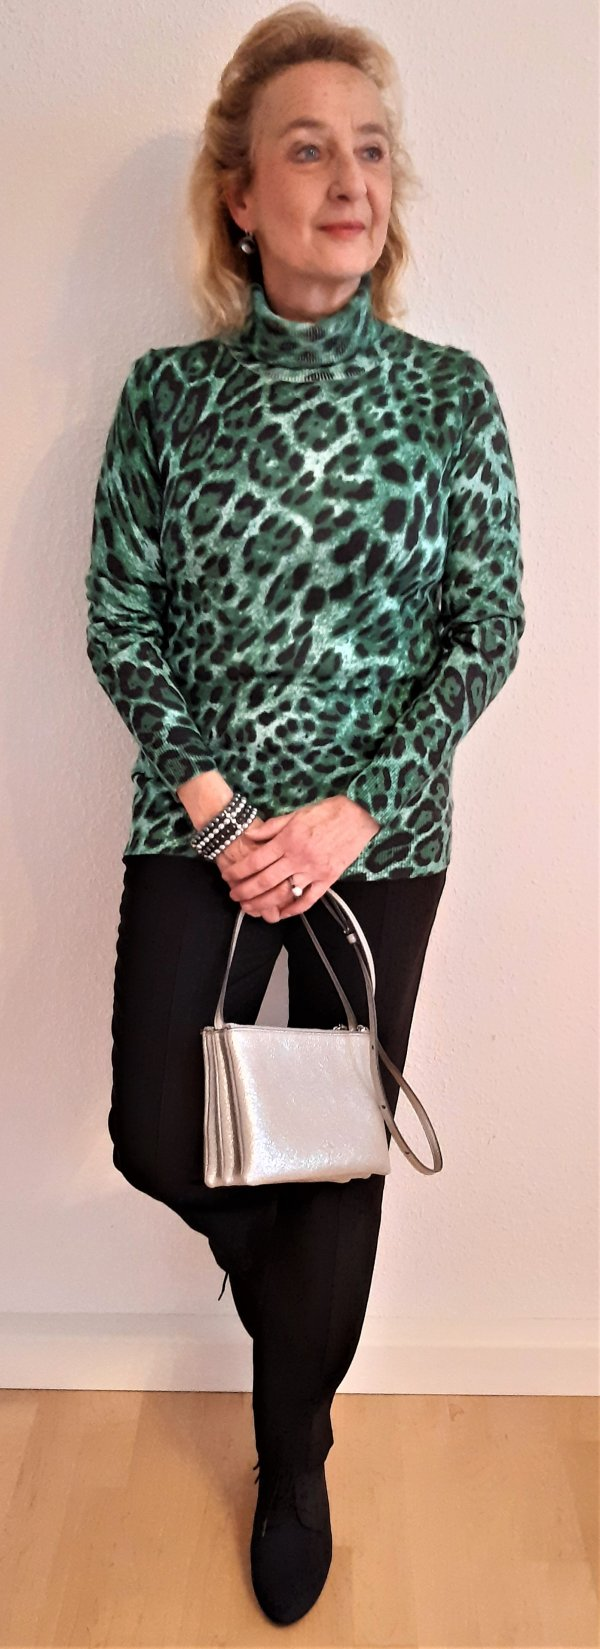 Pullover, Marke Elegance Paris, Leo-Muster